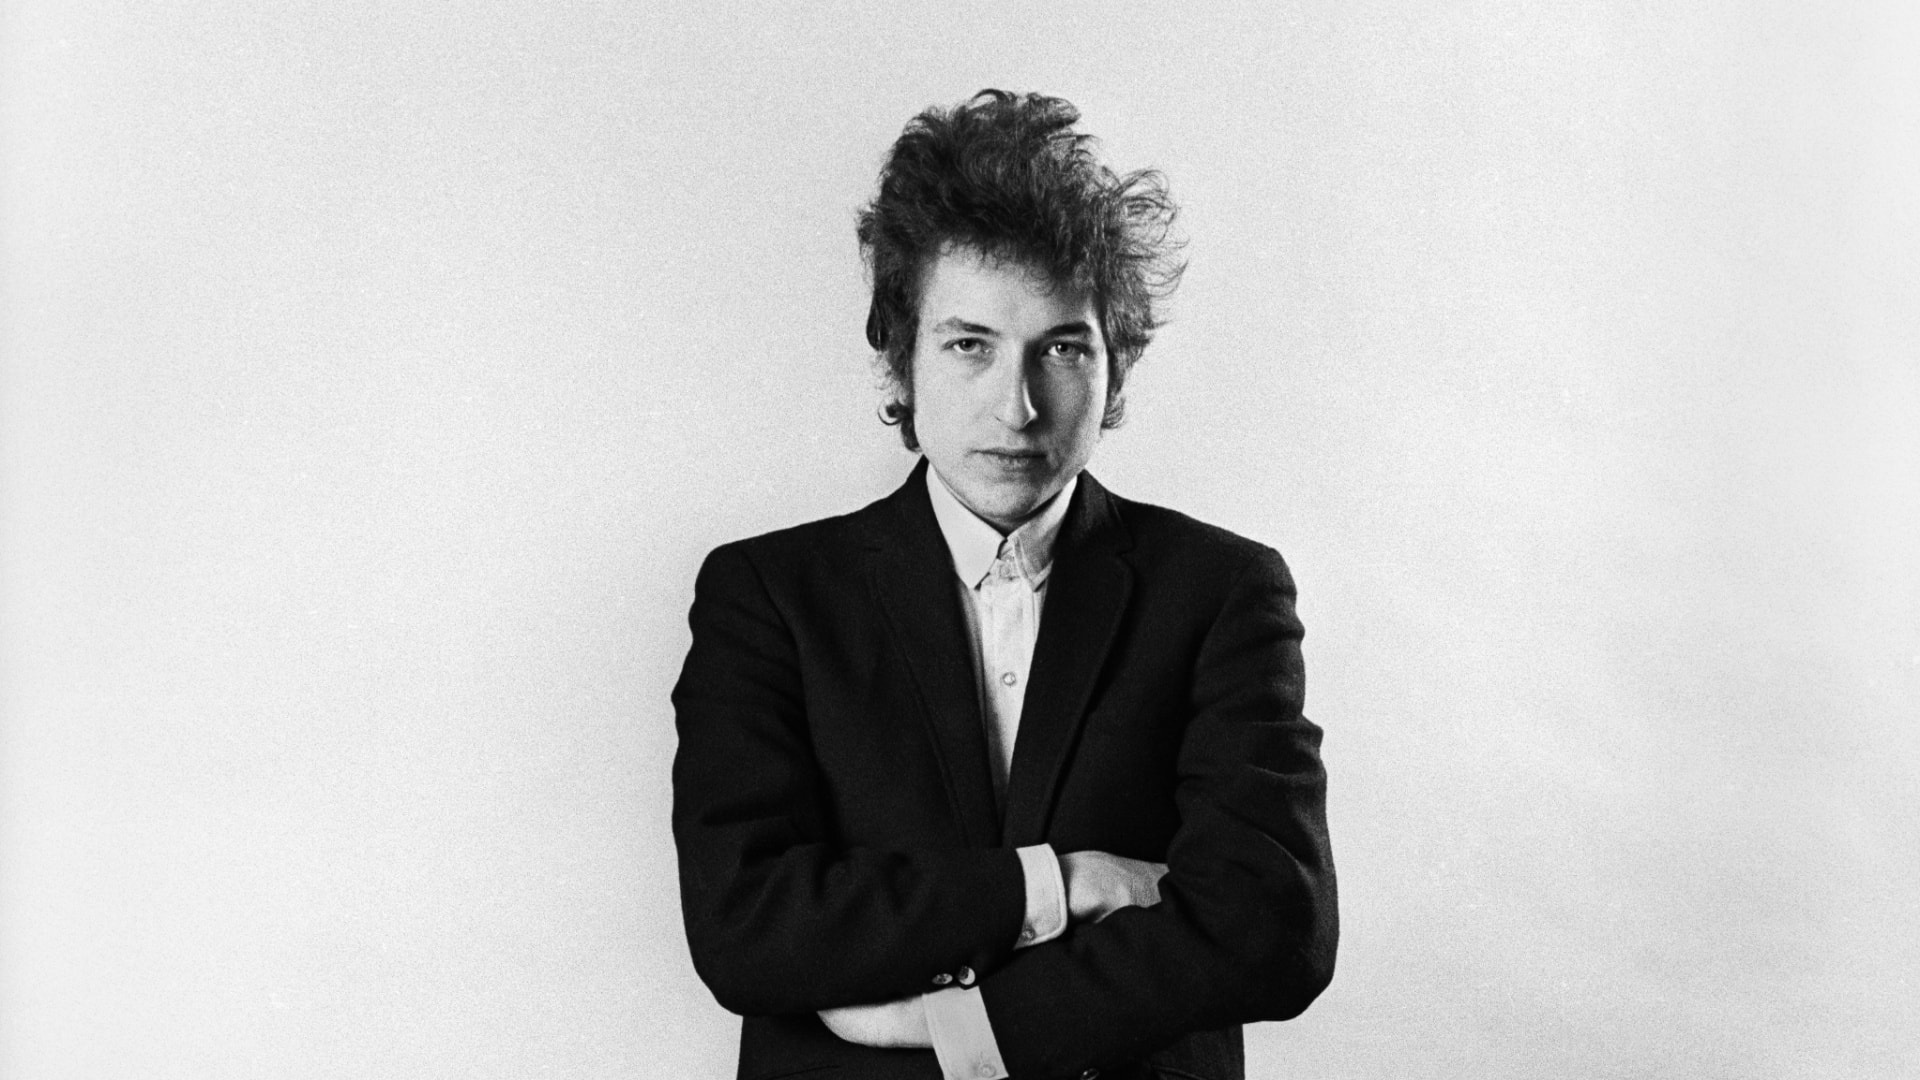 Bob Dylan widescreen wallpapers